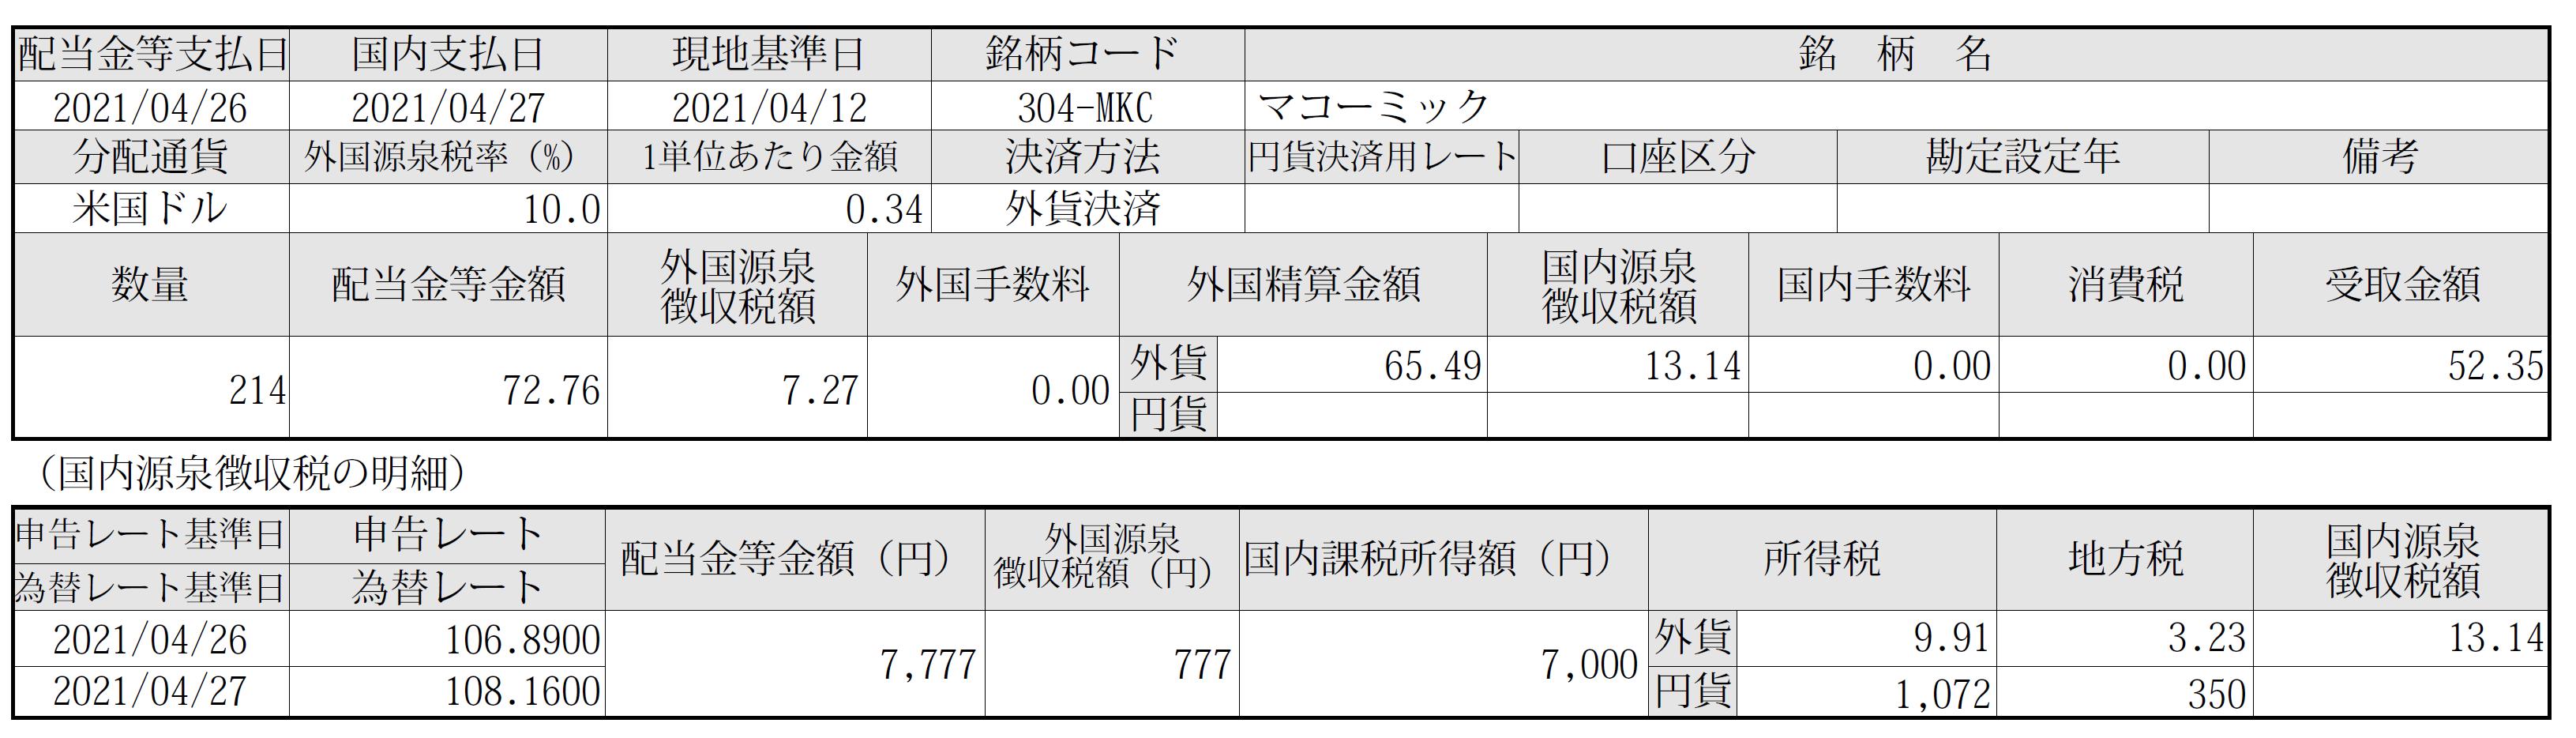 f:id:hodo-work:20210501115526p:plain